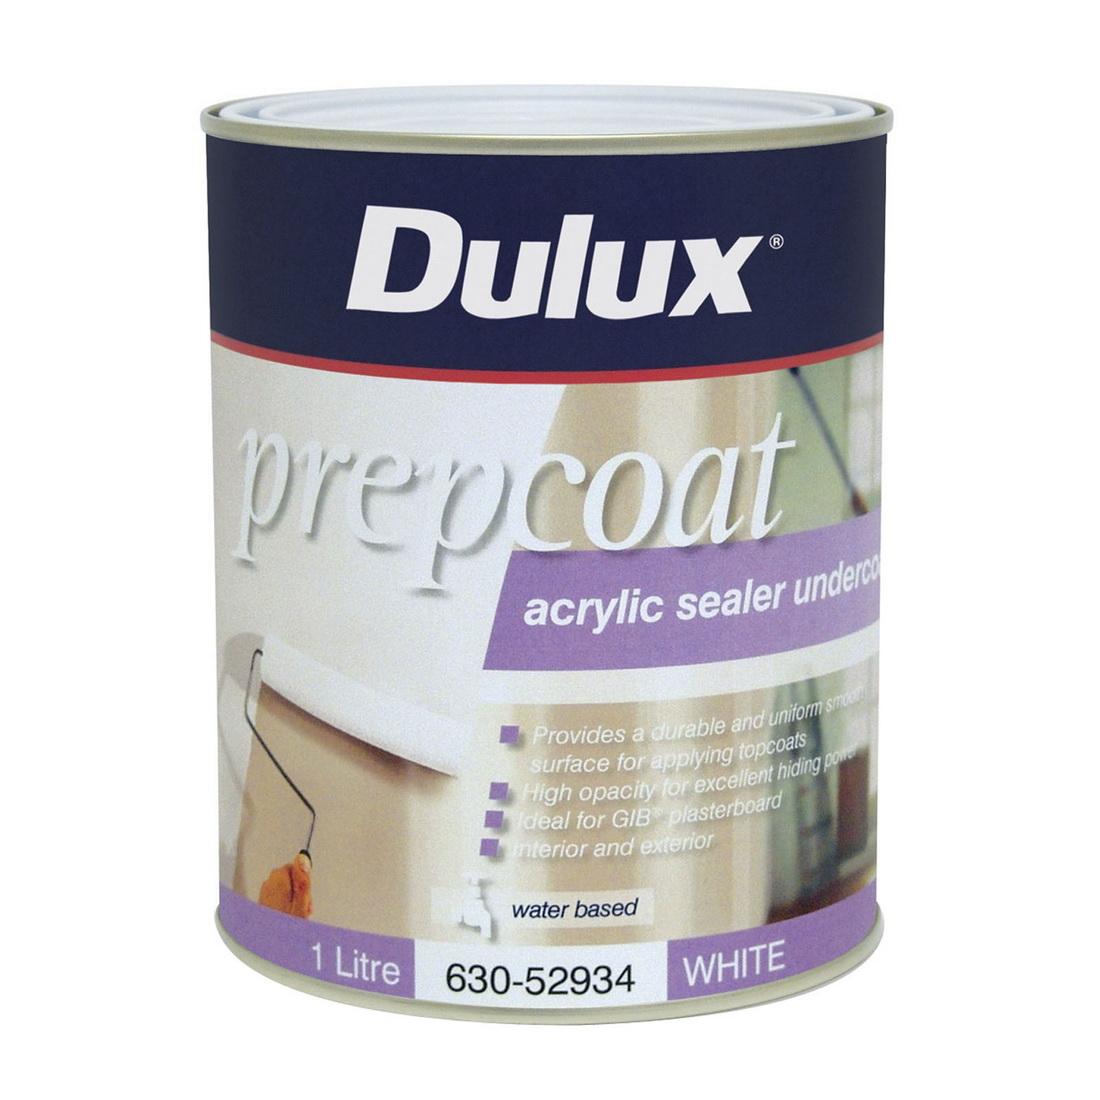 1L Water Based Prepcoat Acrylic Sealer Undercoat White